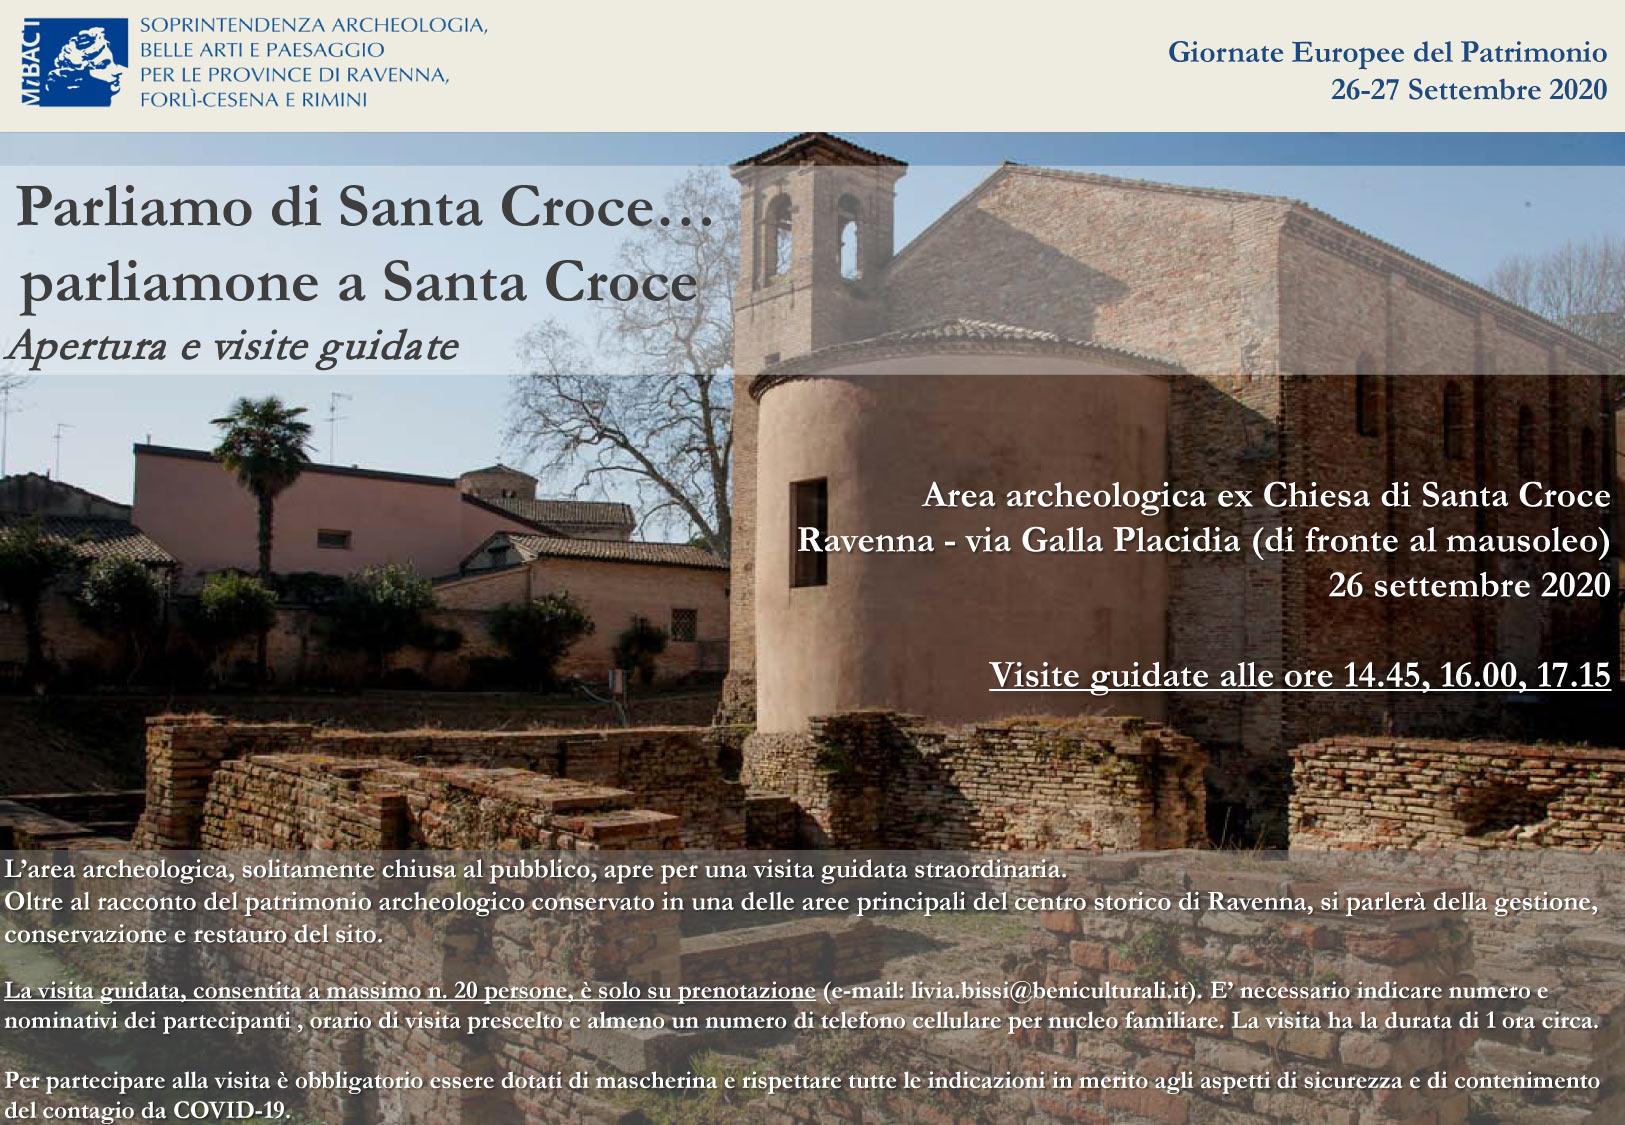 Parliamo di Santa Croce... parliamone a Santa Croce